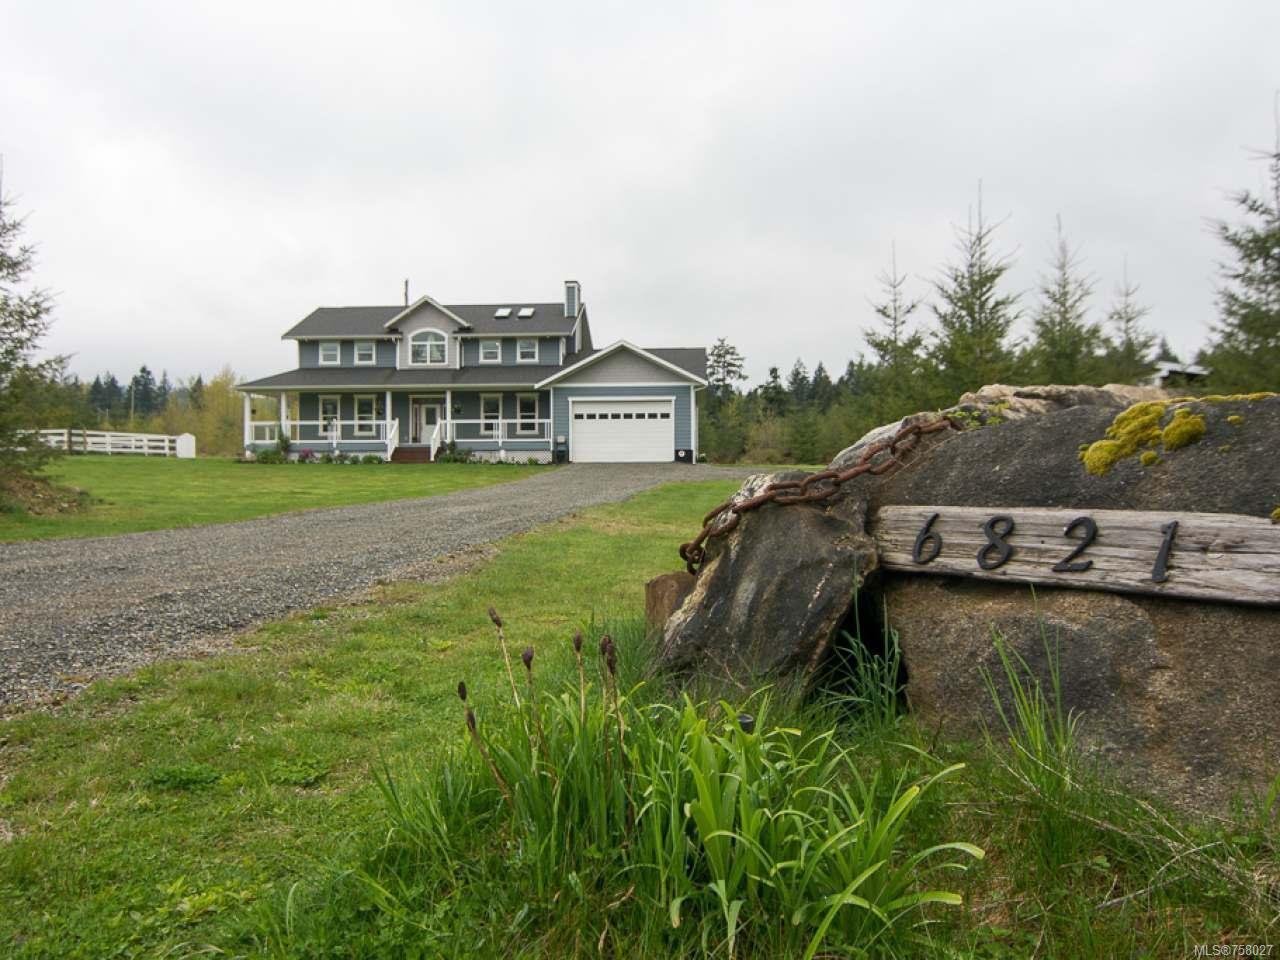 Main Photo: 6821 FARNHAM ROAD in MERVILLE: CV Merville Black Creek House for sale (Comox Valley)  : MLS®# 758027